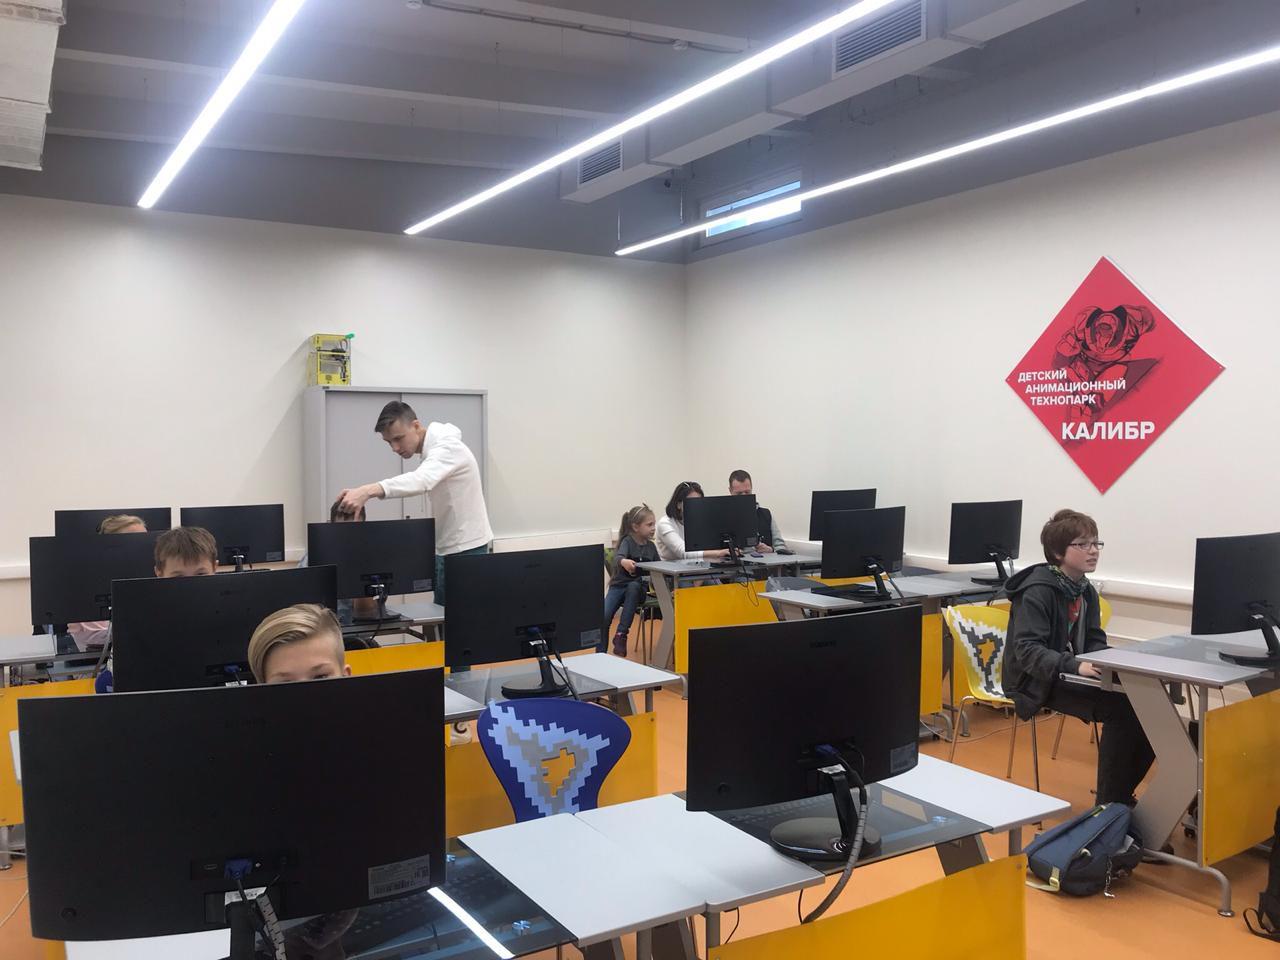 Онлайн-курсы в детских технопарках фото 4